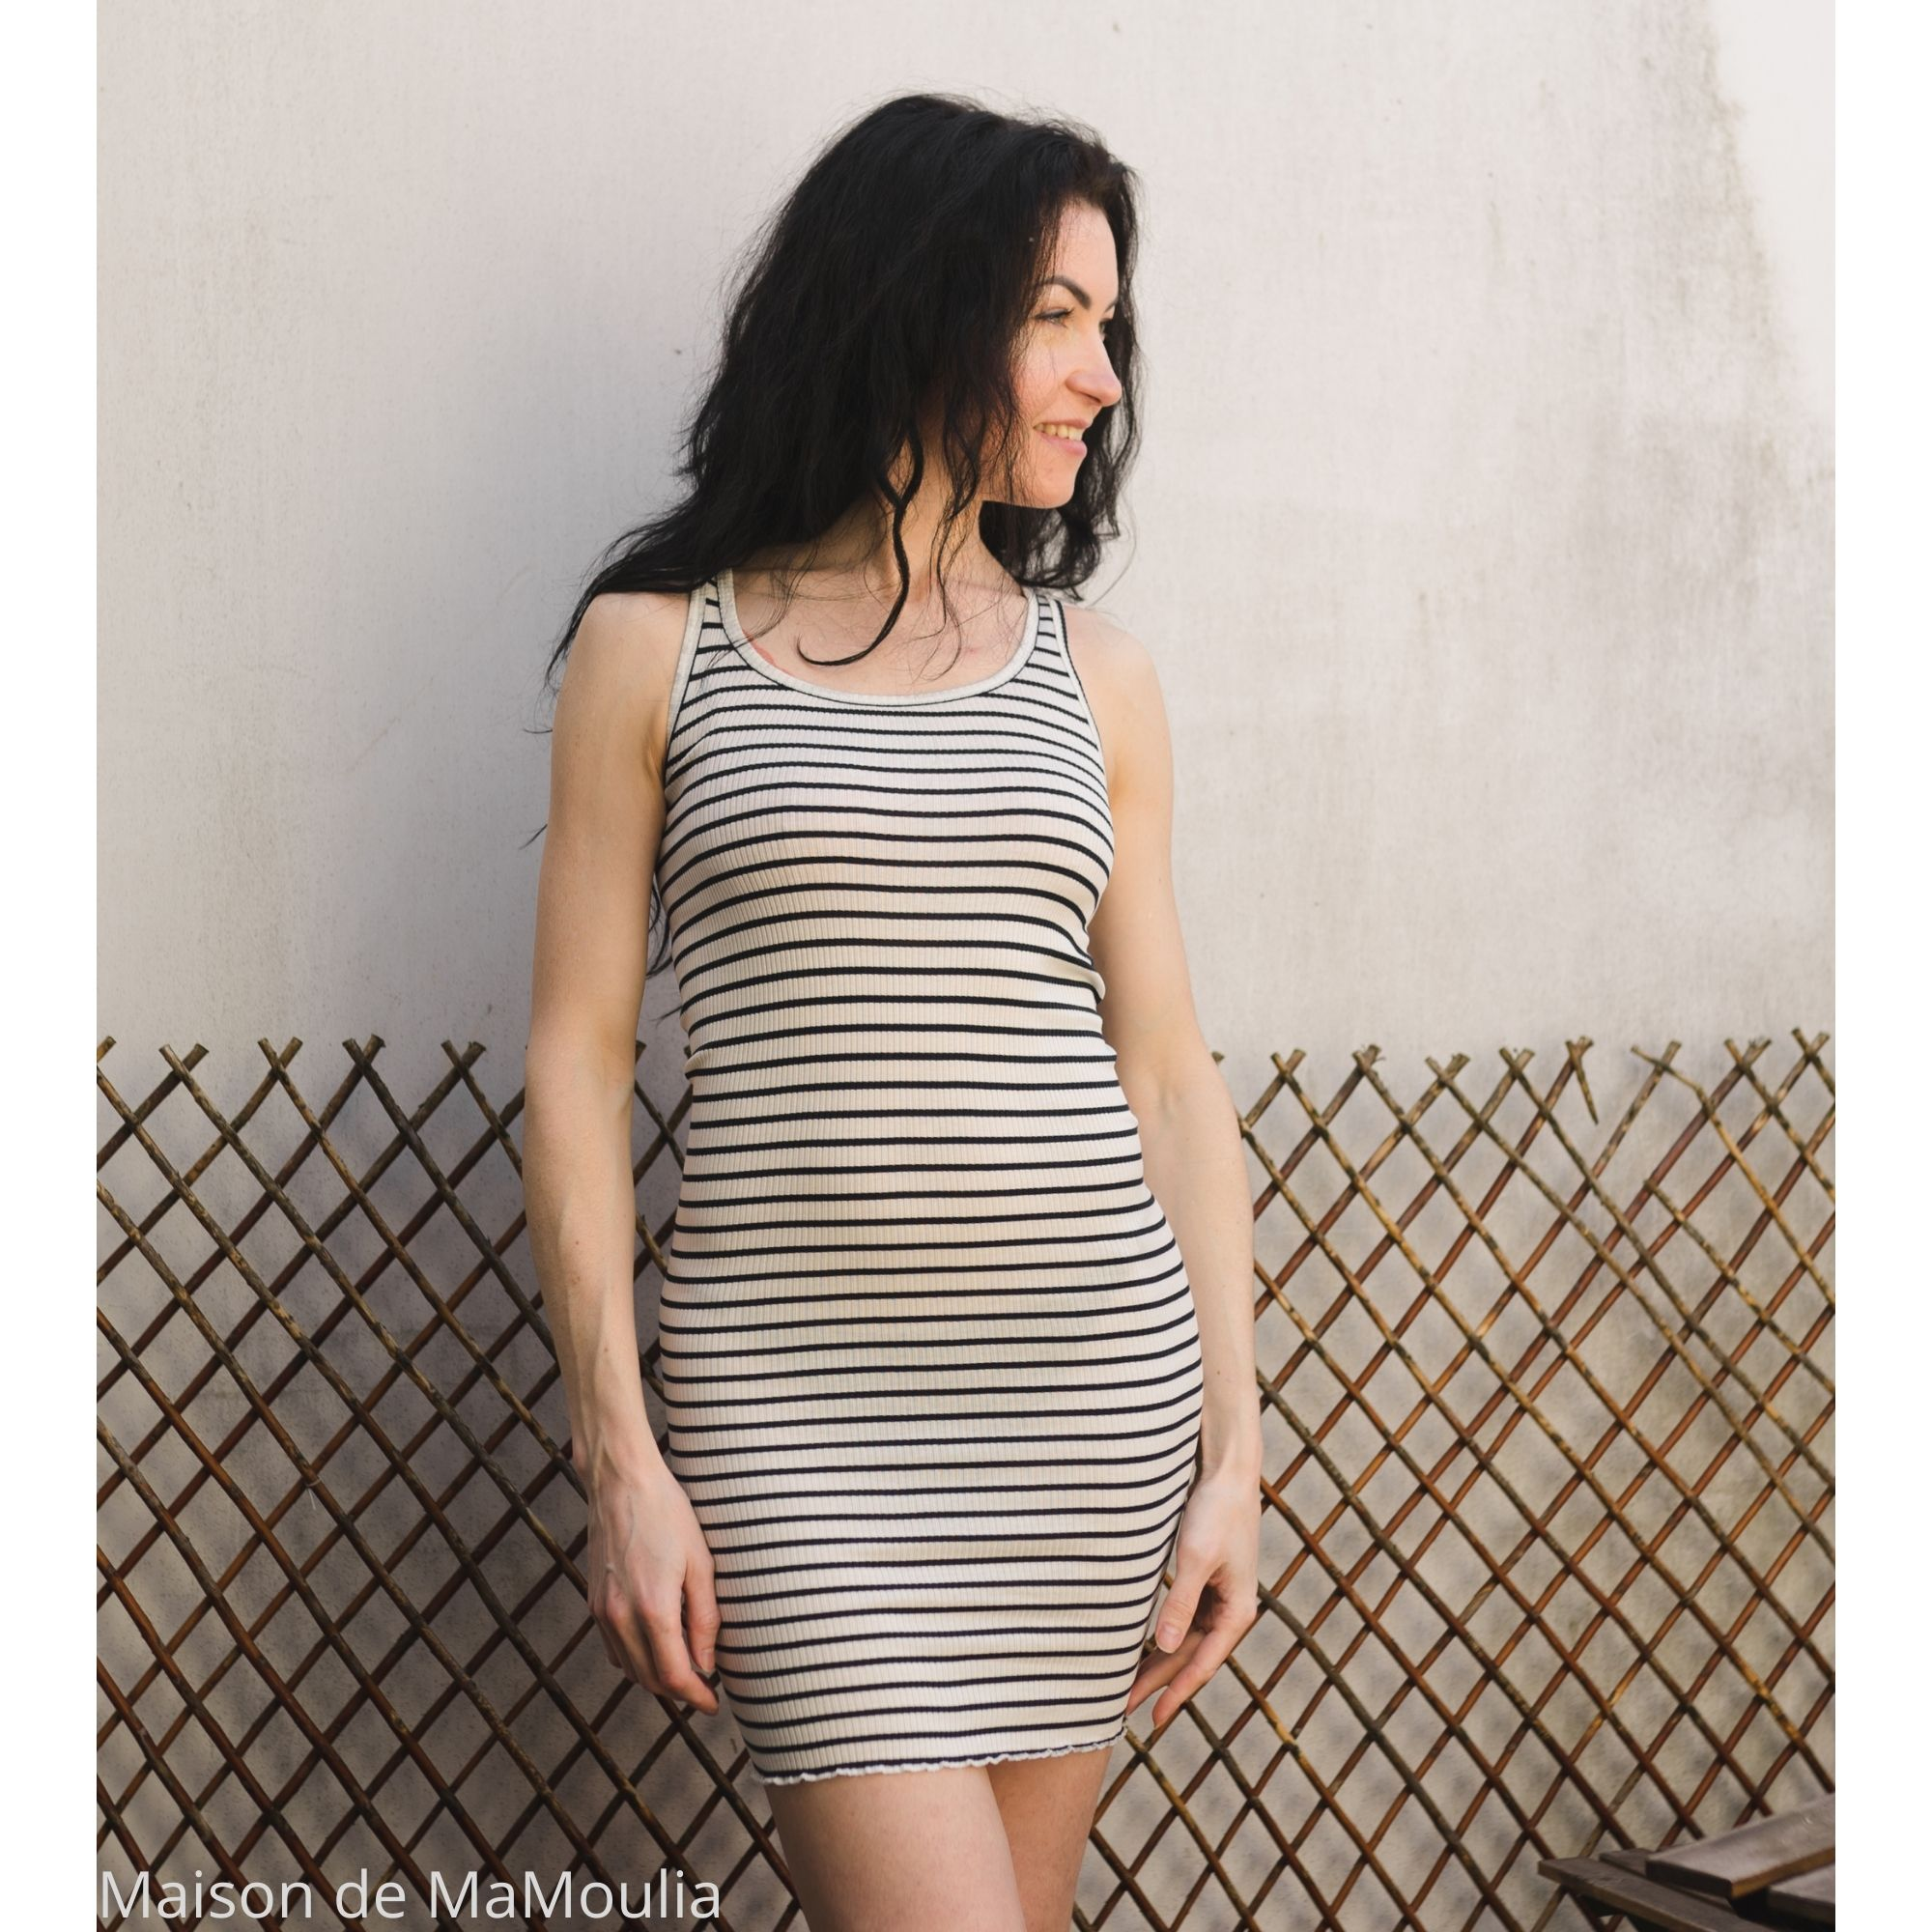 minimalisma-sailor-tshirt-robe-debardeur-femme-soie-coton-maison-de-mamoulia-rayures-blanc-noir-sans -manches--